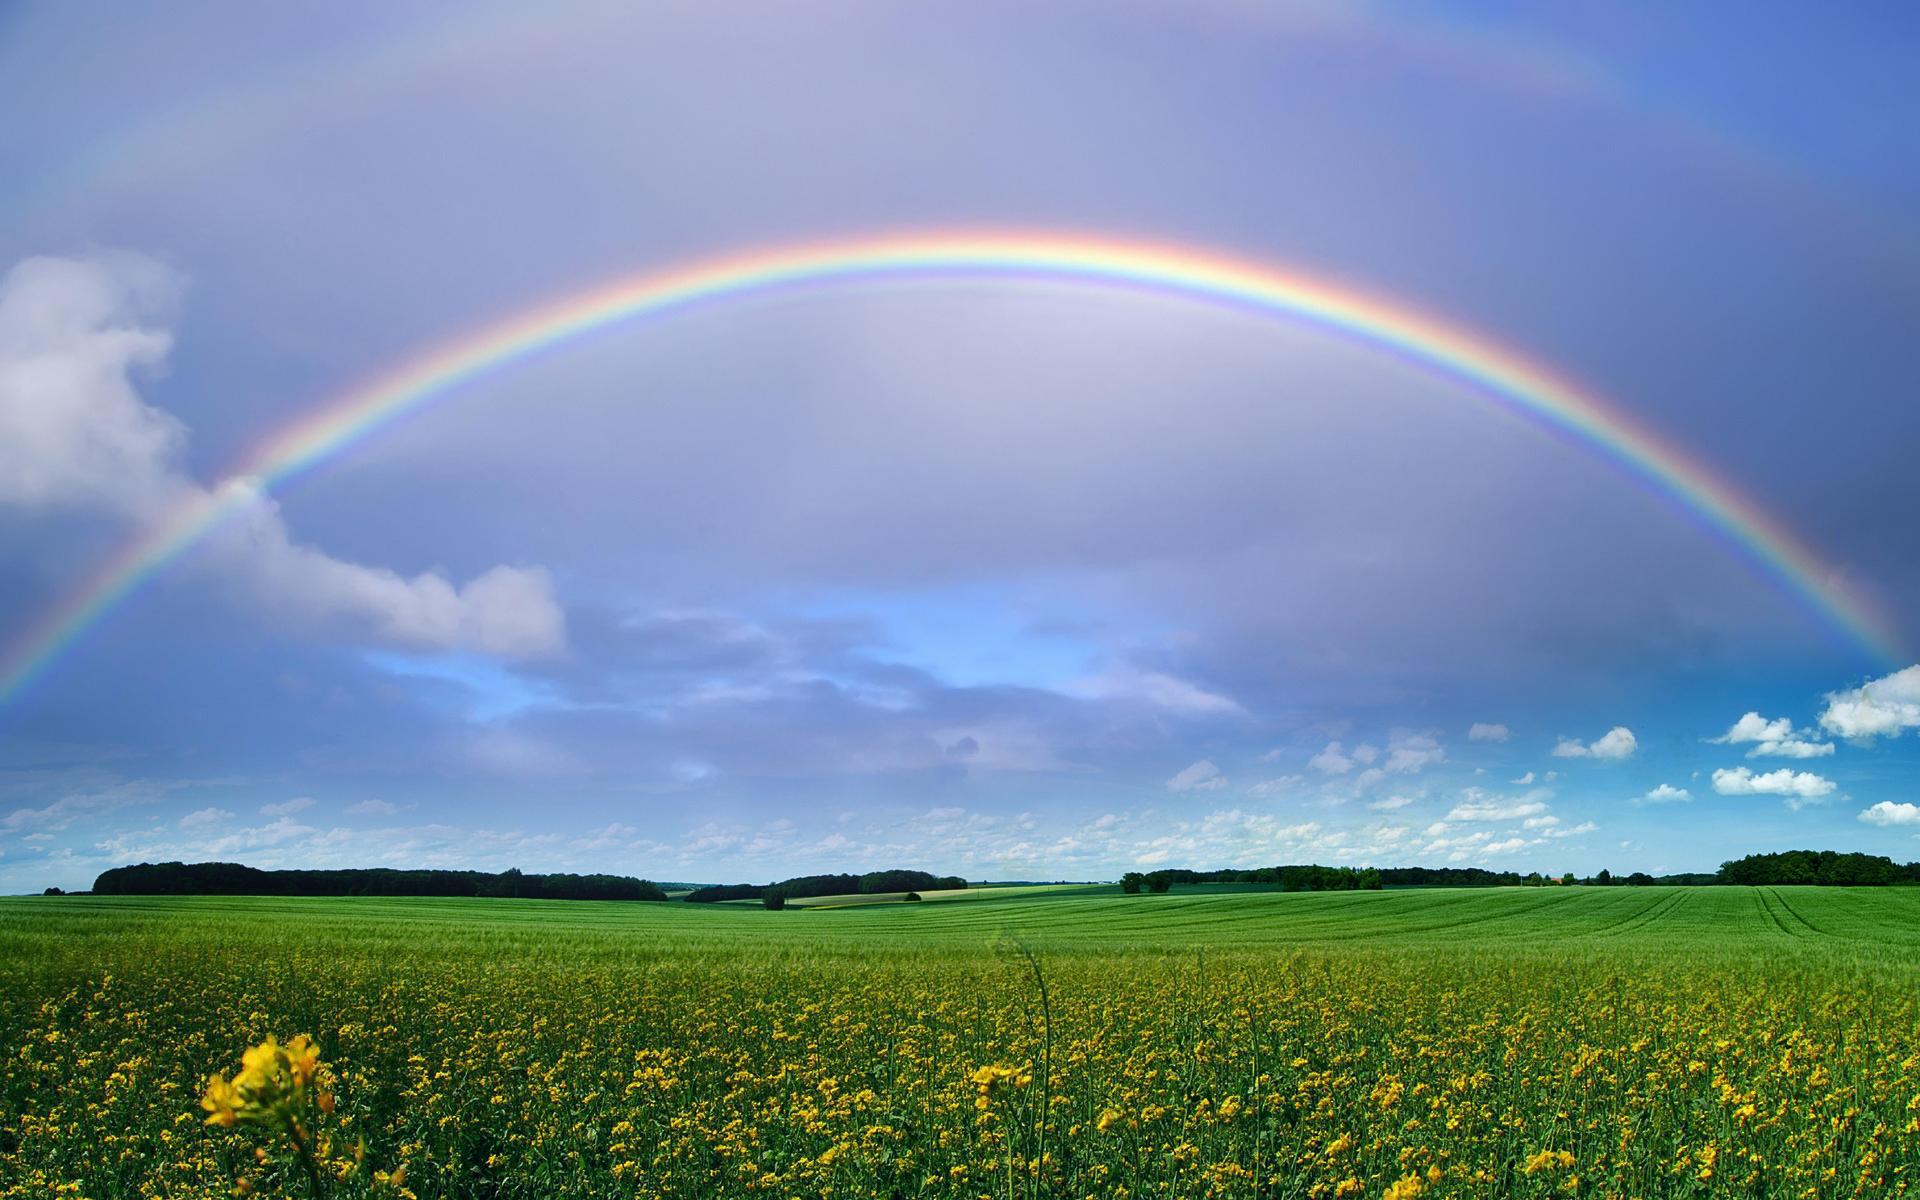 Real Rainbow Clipart - Clipart Kid